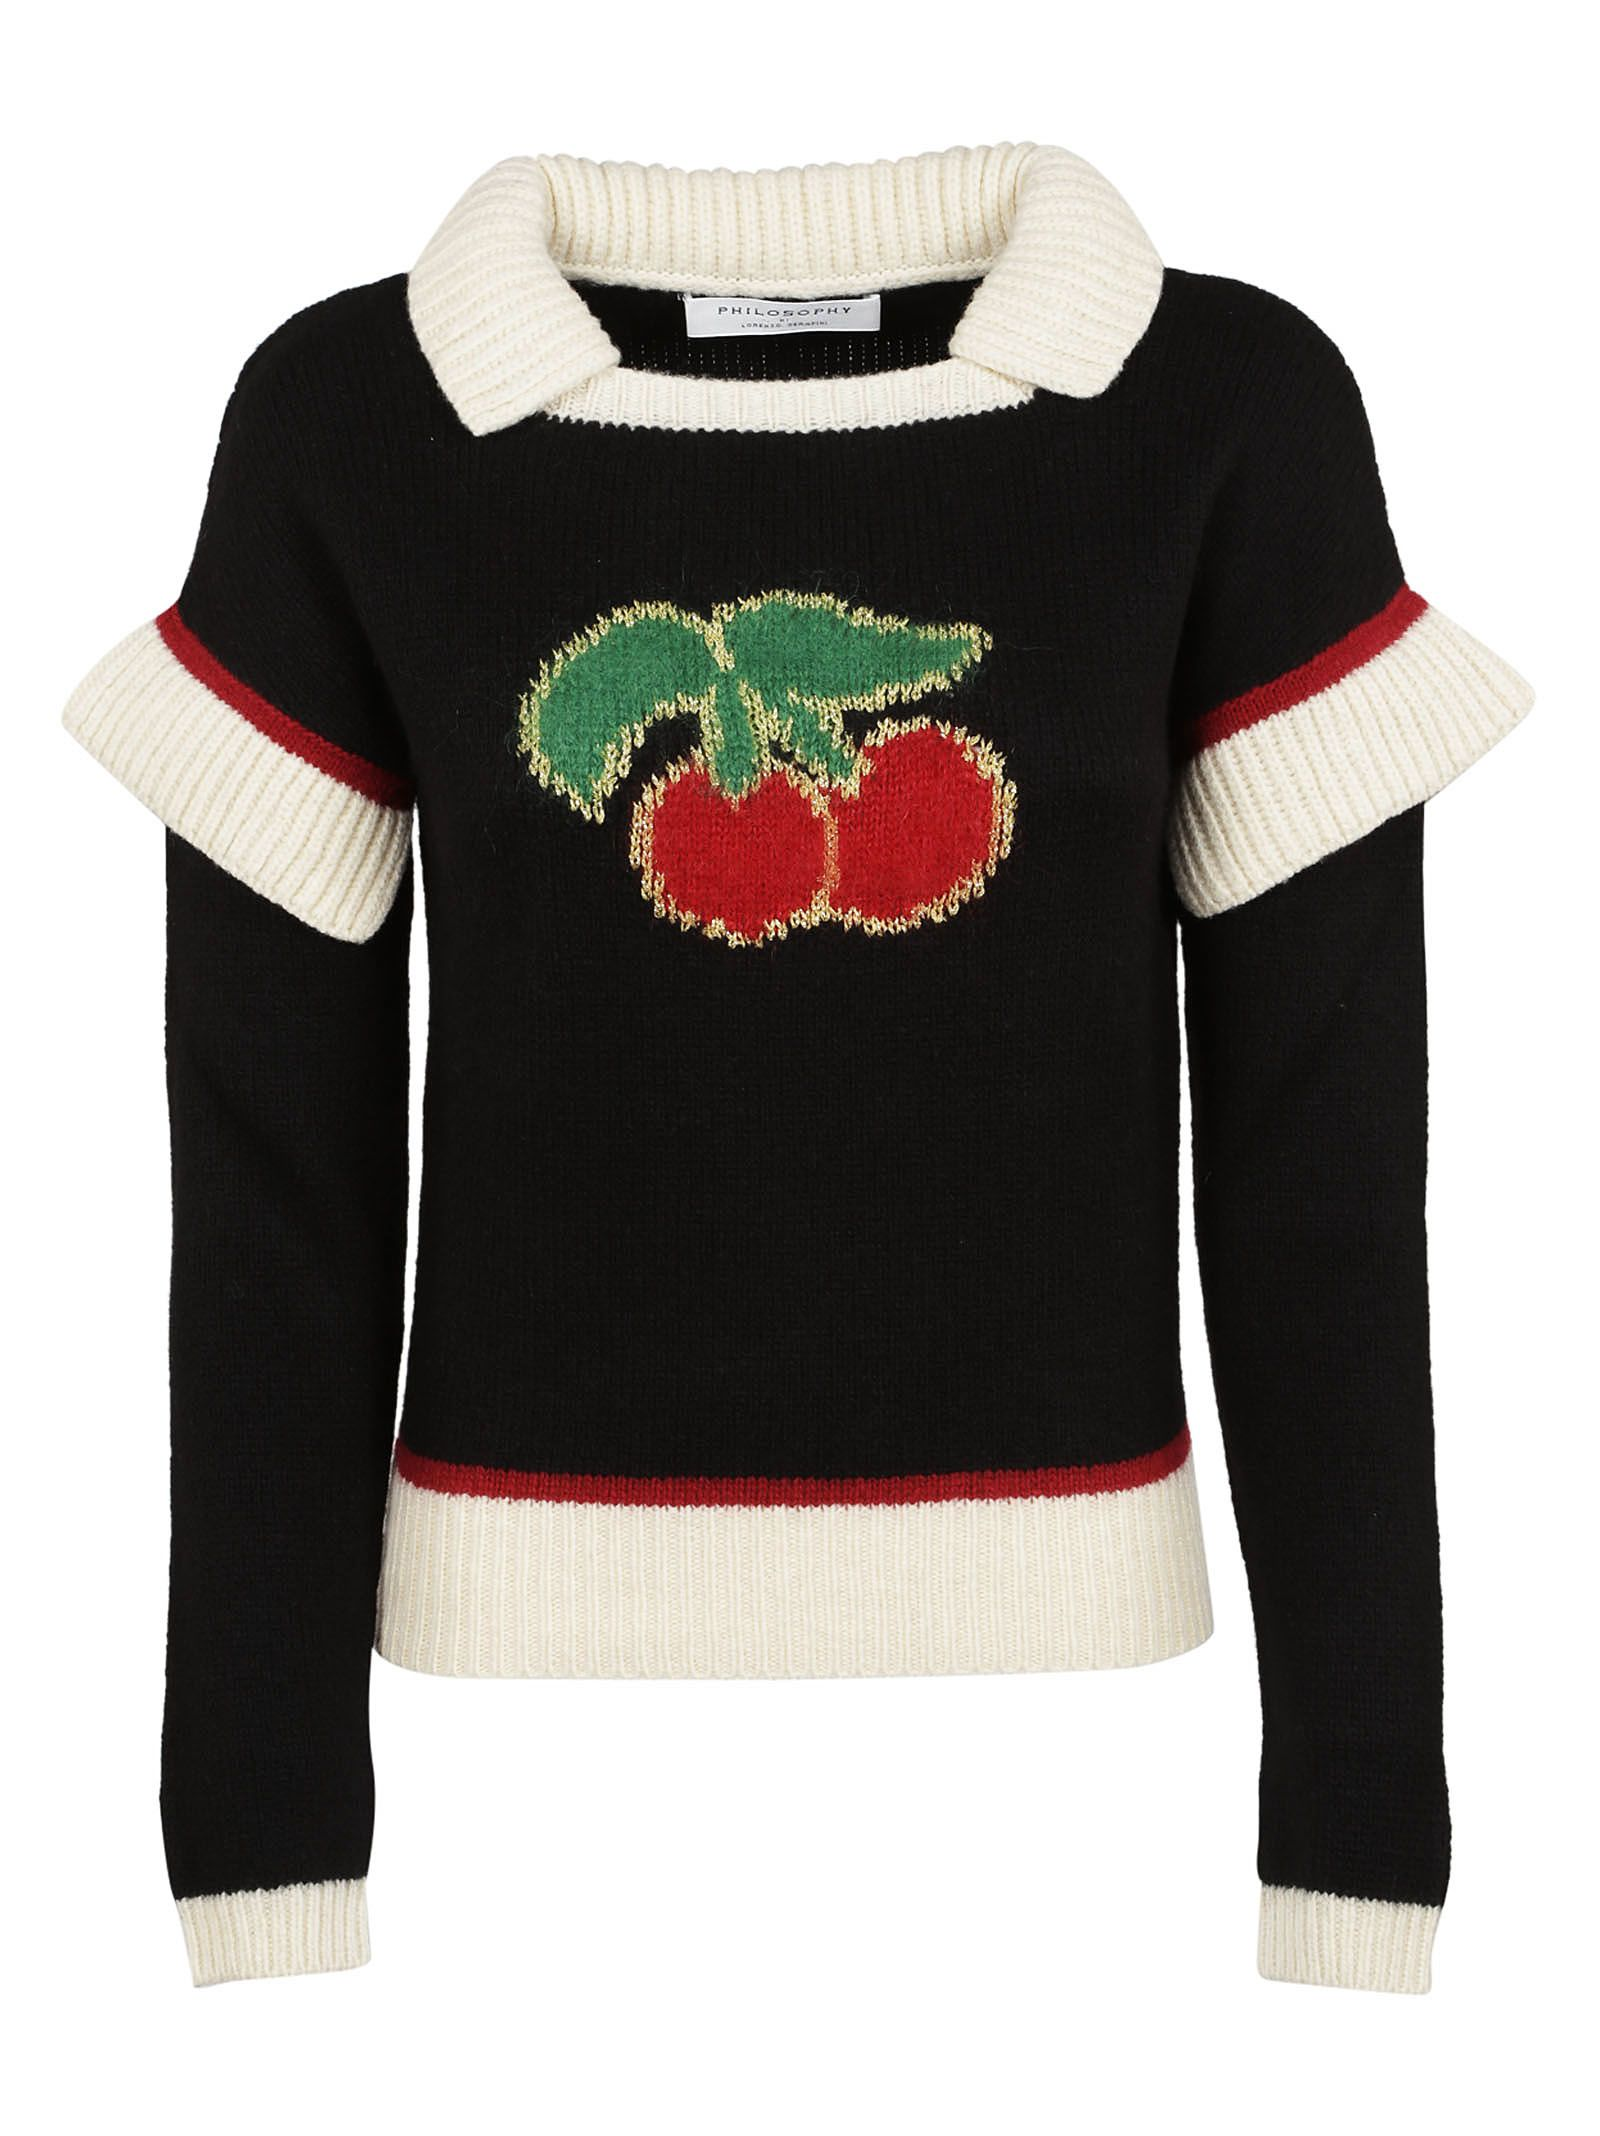 Philosophy Di Lorenzo Serafini Cherry Embroidered Sweater